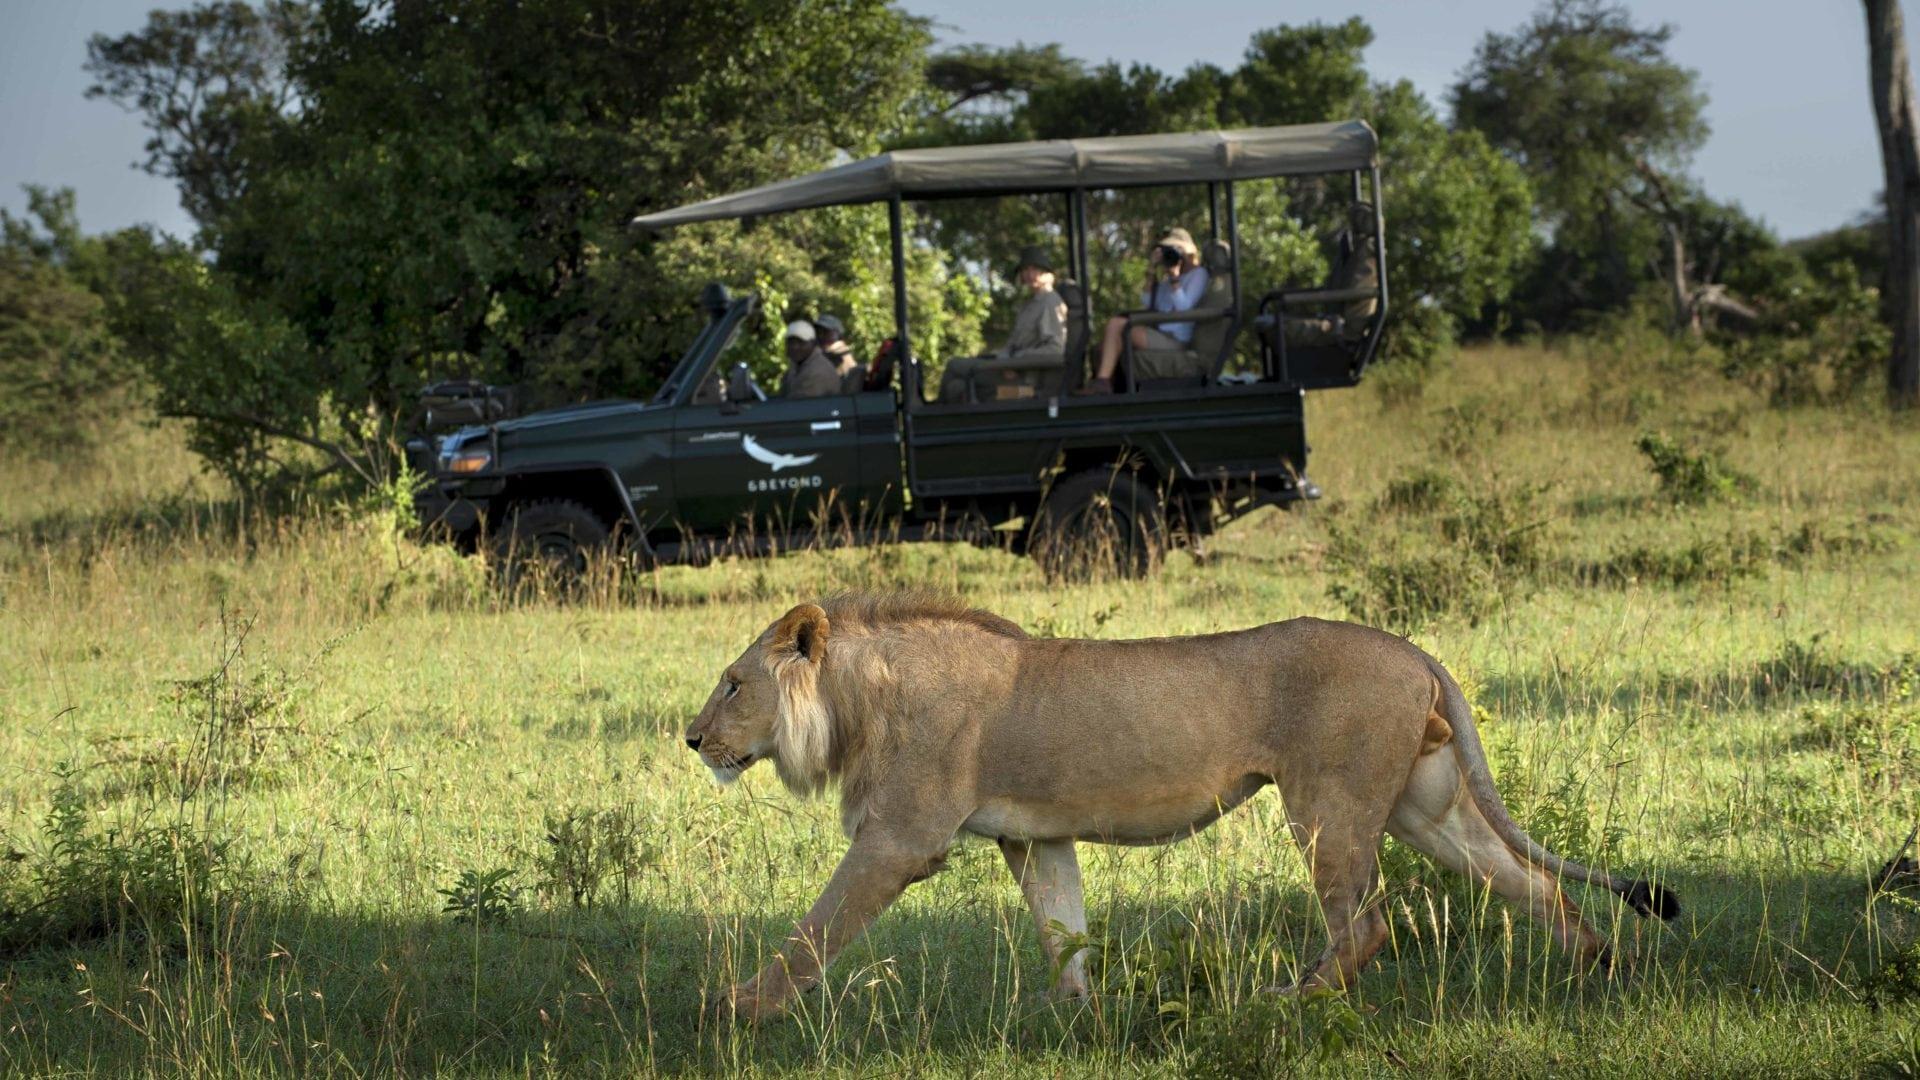 Luxe reizen Tanzania - Wildrit in open safari voertuig bij &Beyond Klein's Camp